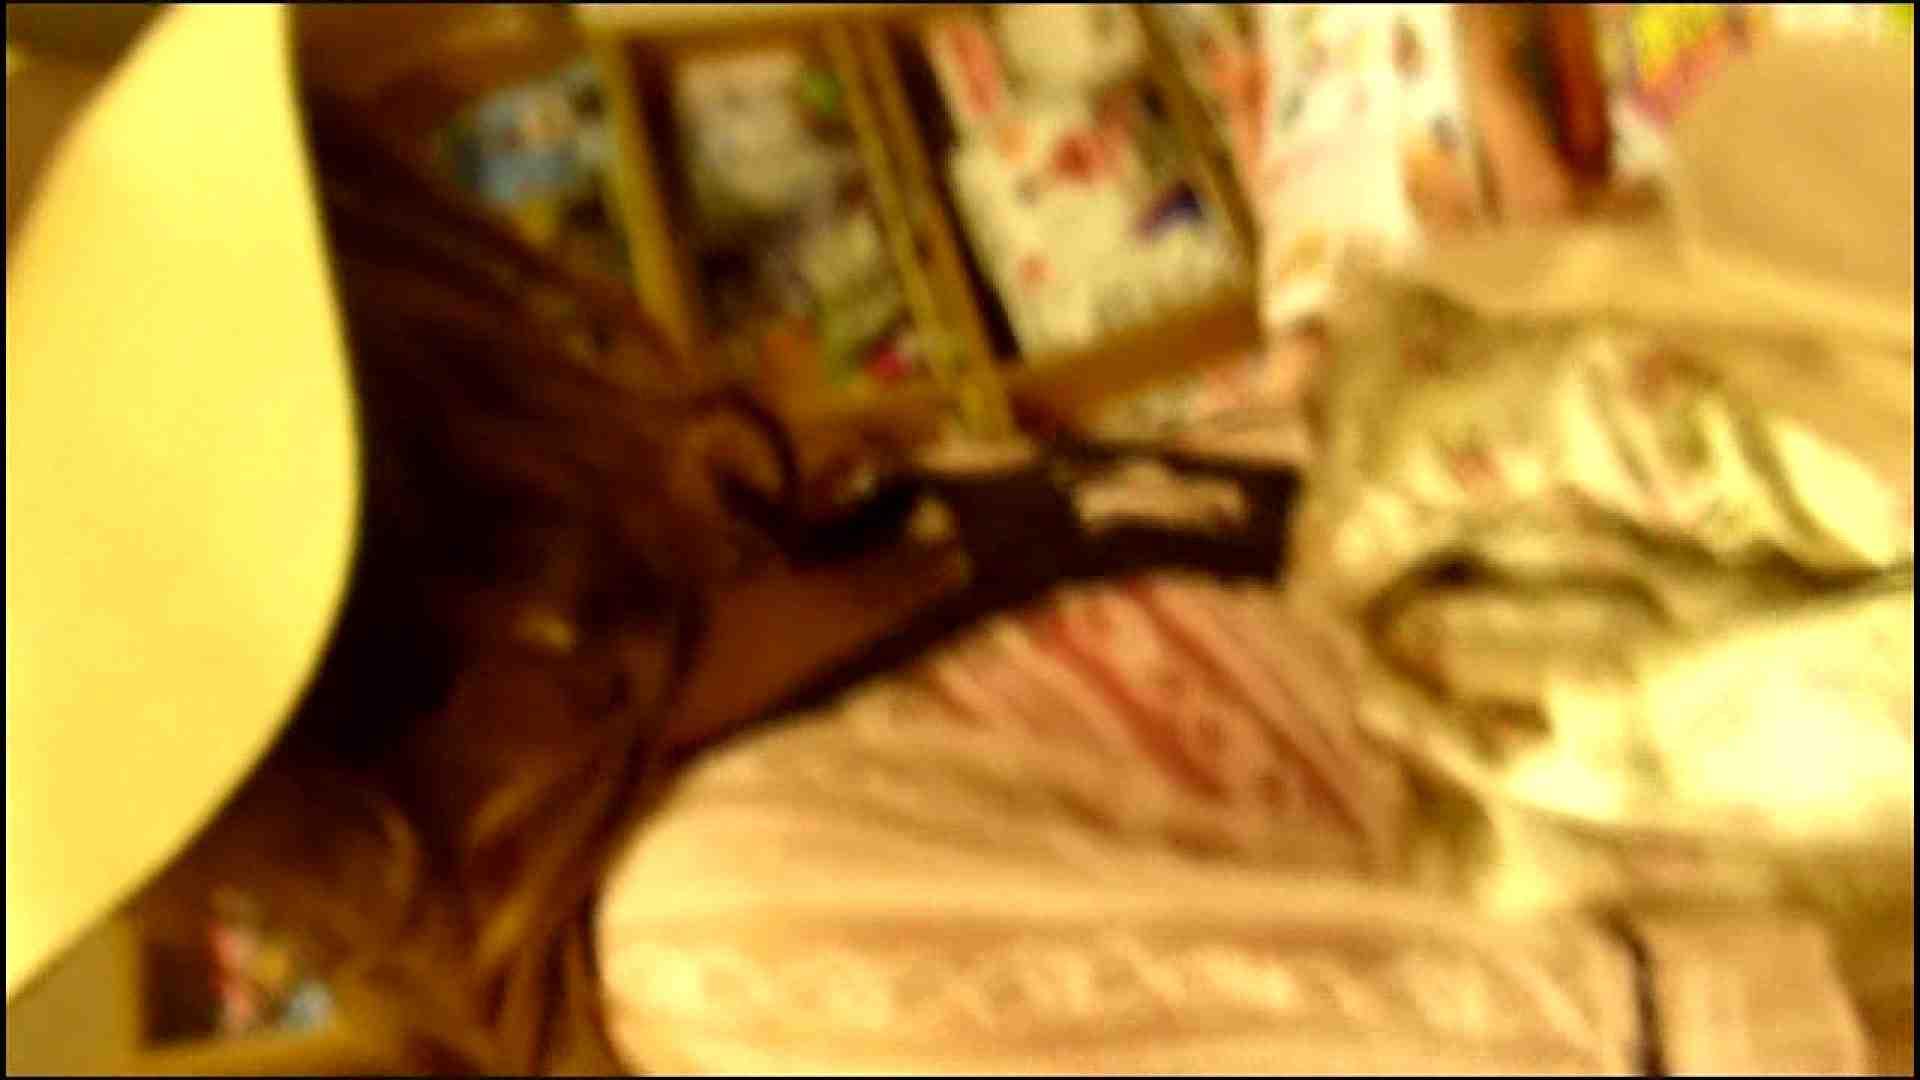 NO.2 本屋にいた巨乳ギャル 胸チラ・のぞき ぱこり動画紹介 95枚 27